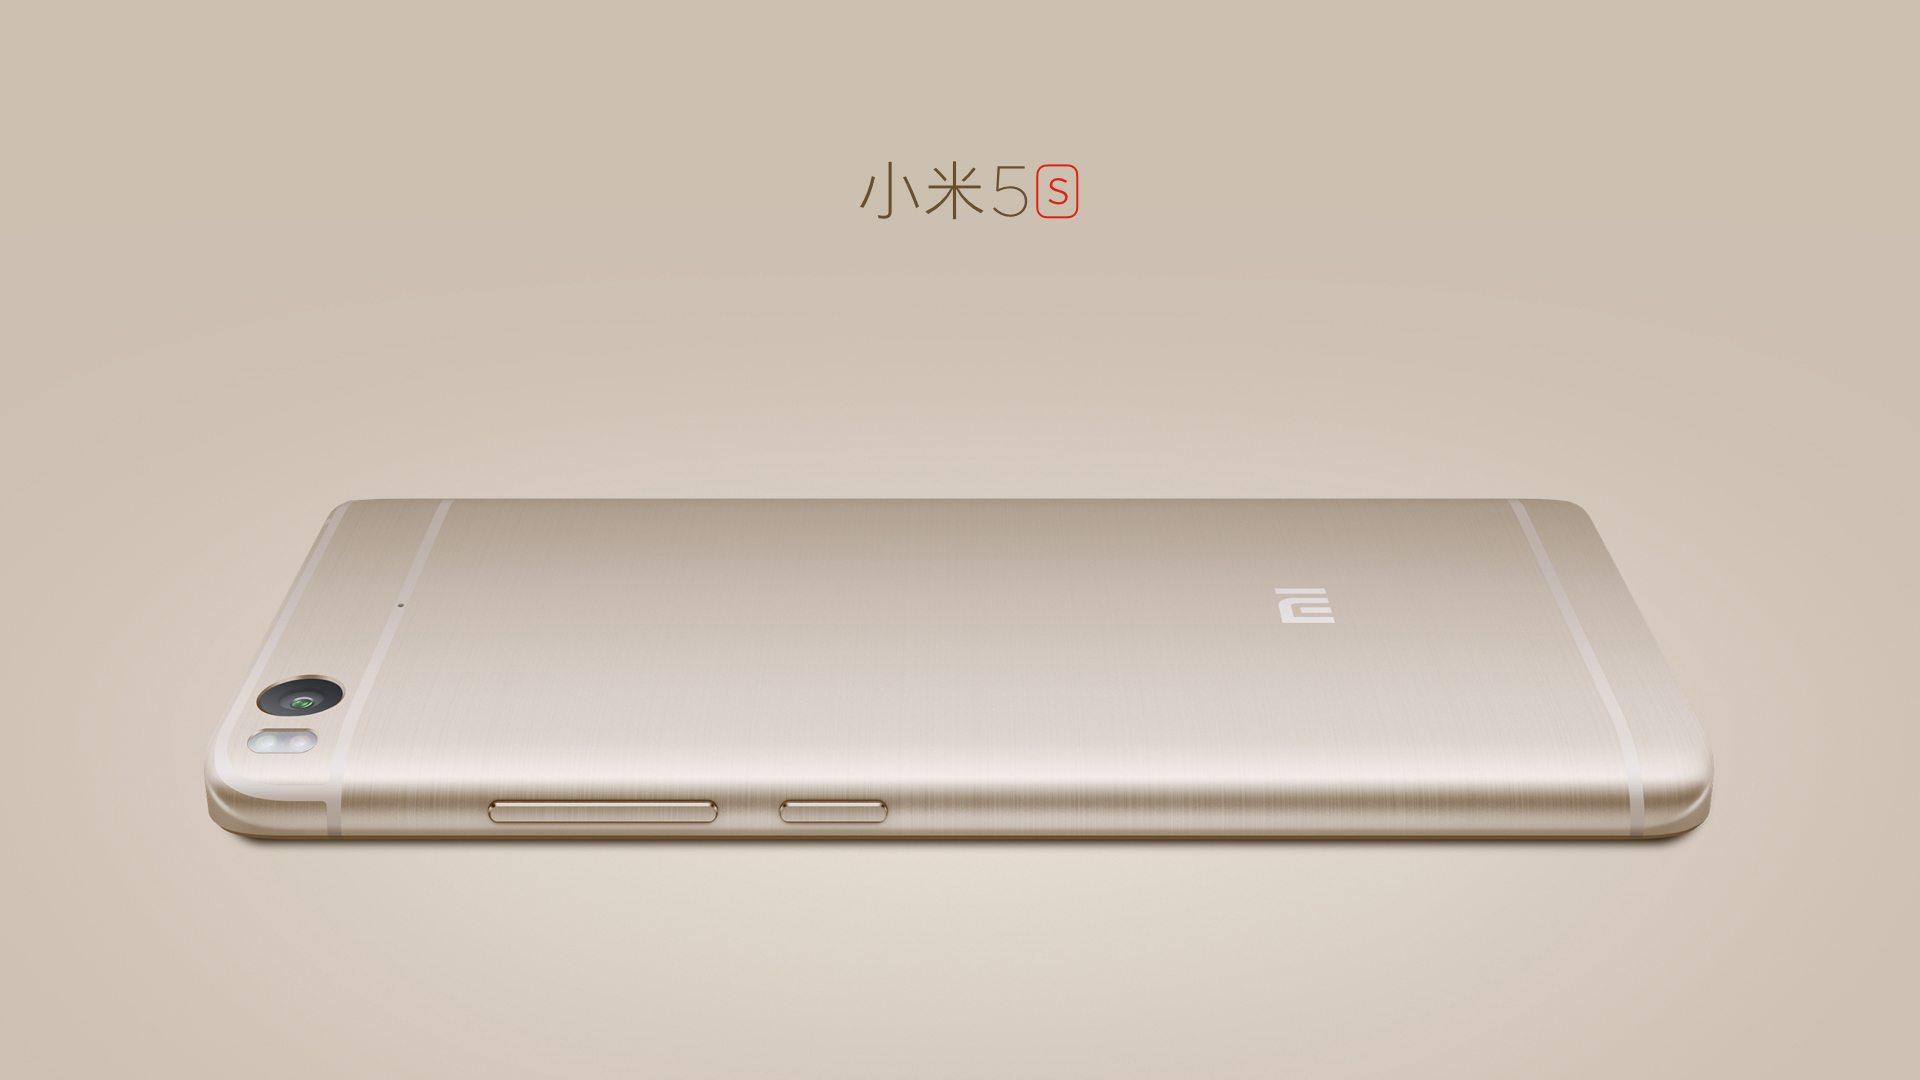 xiaomi-mi5s-oficialne-foto-7